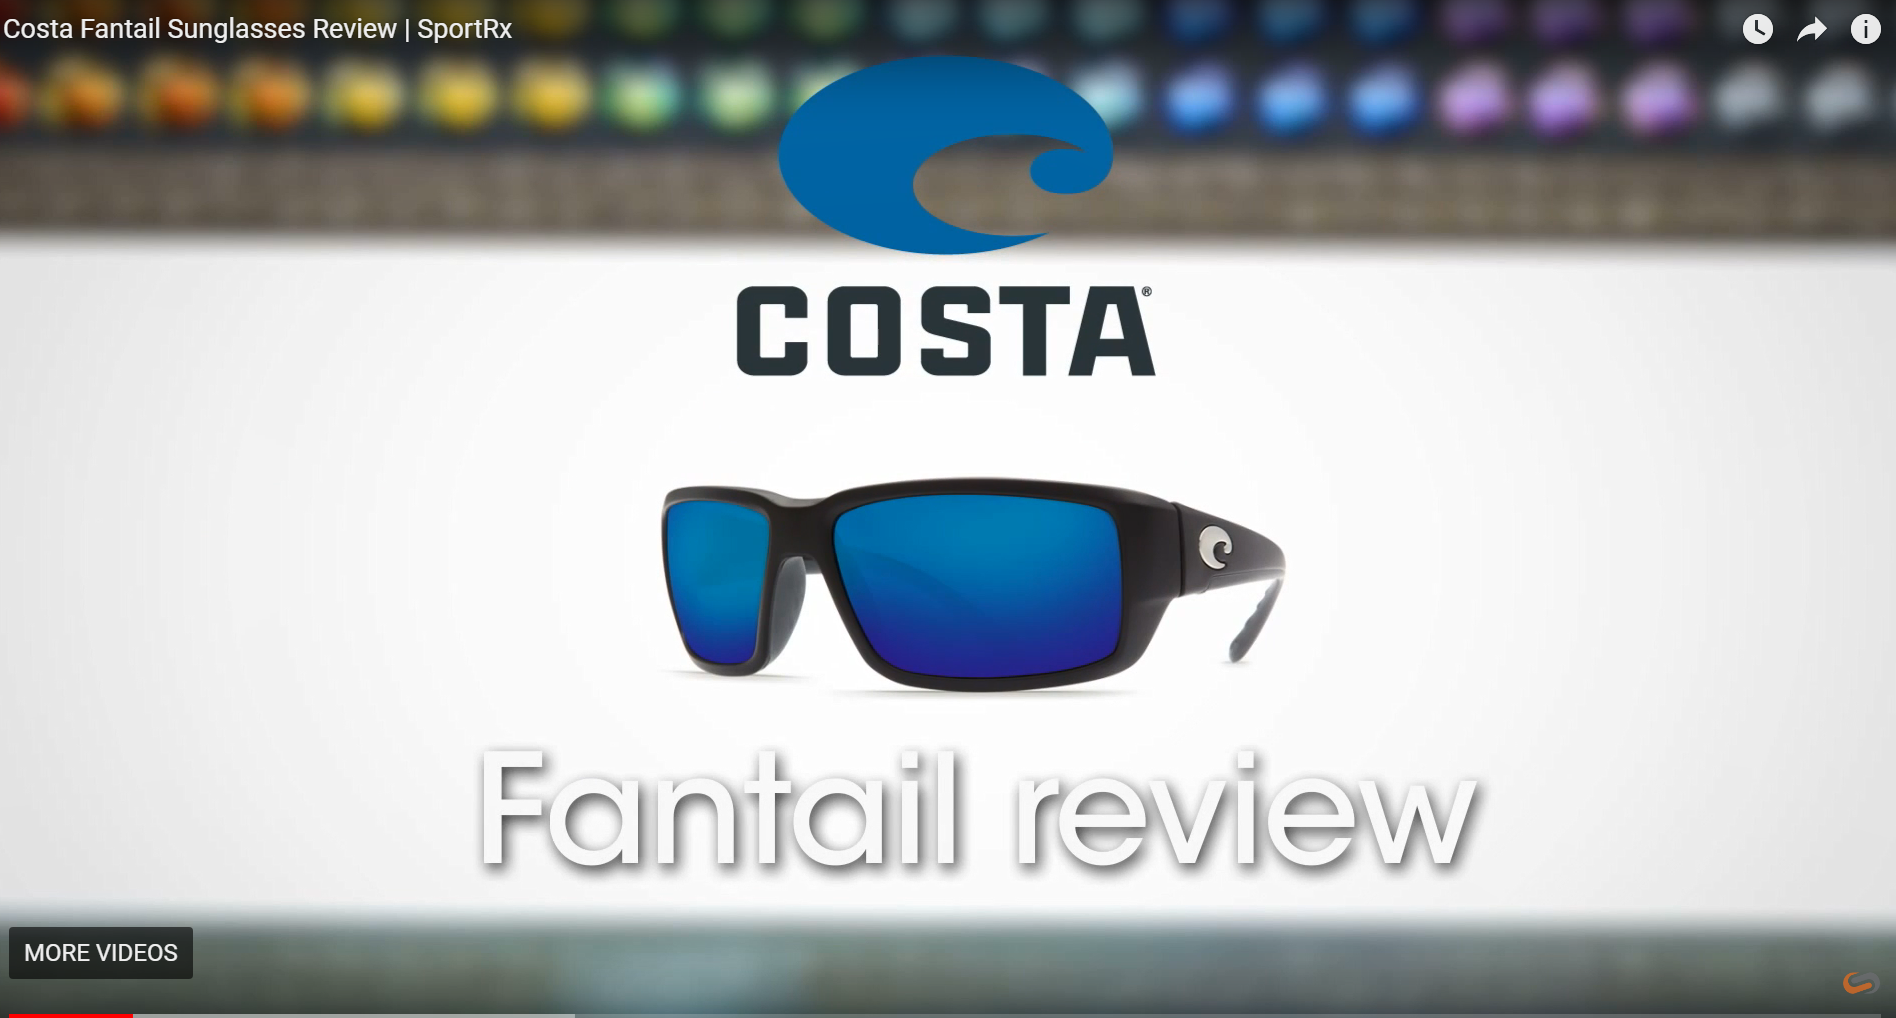 Costa Fantail Sunglasses Review | Costa Fishing Sunglasses